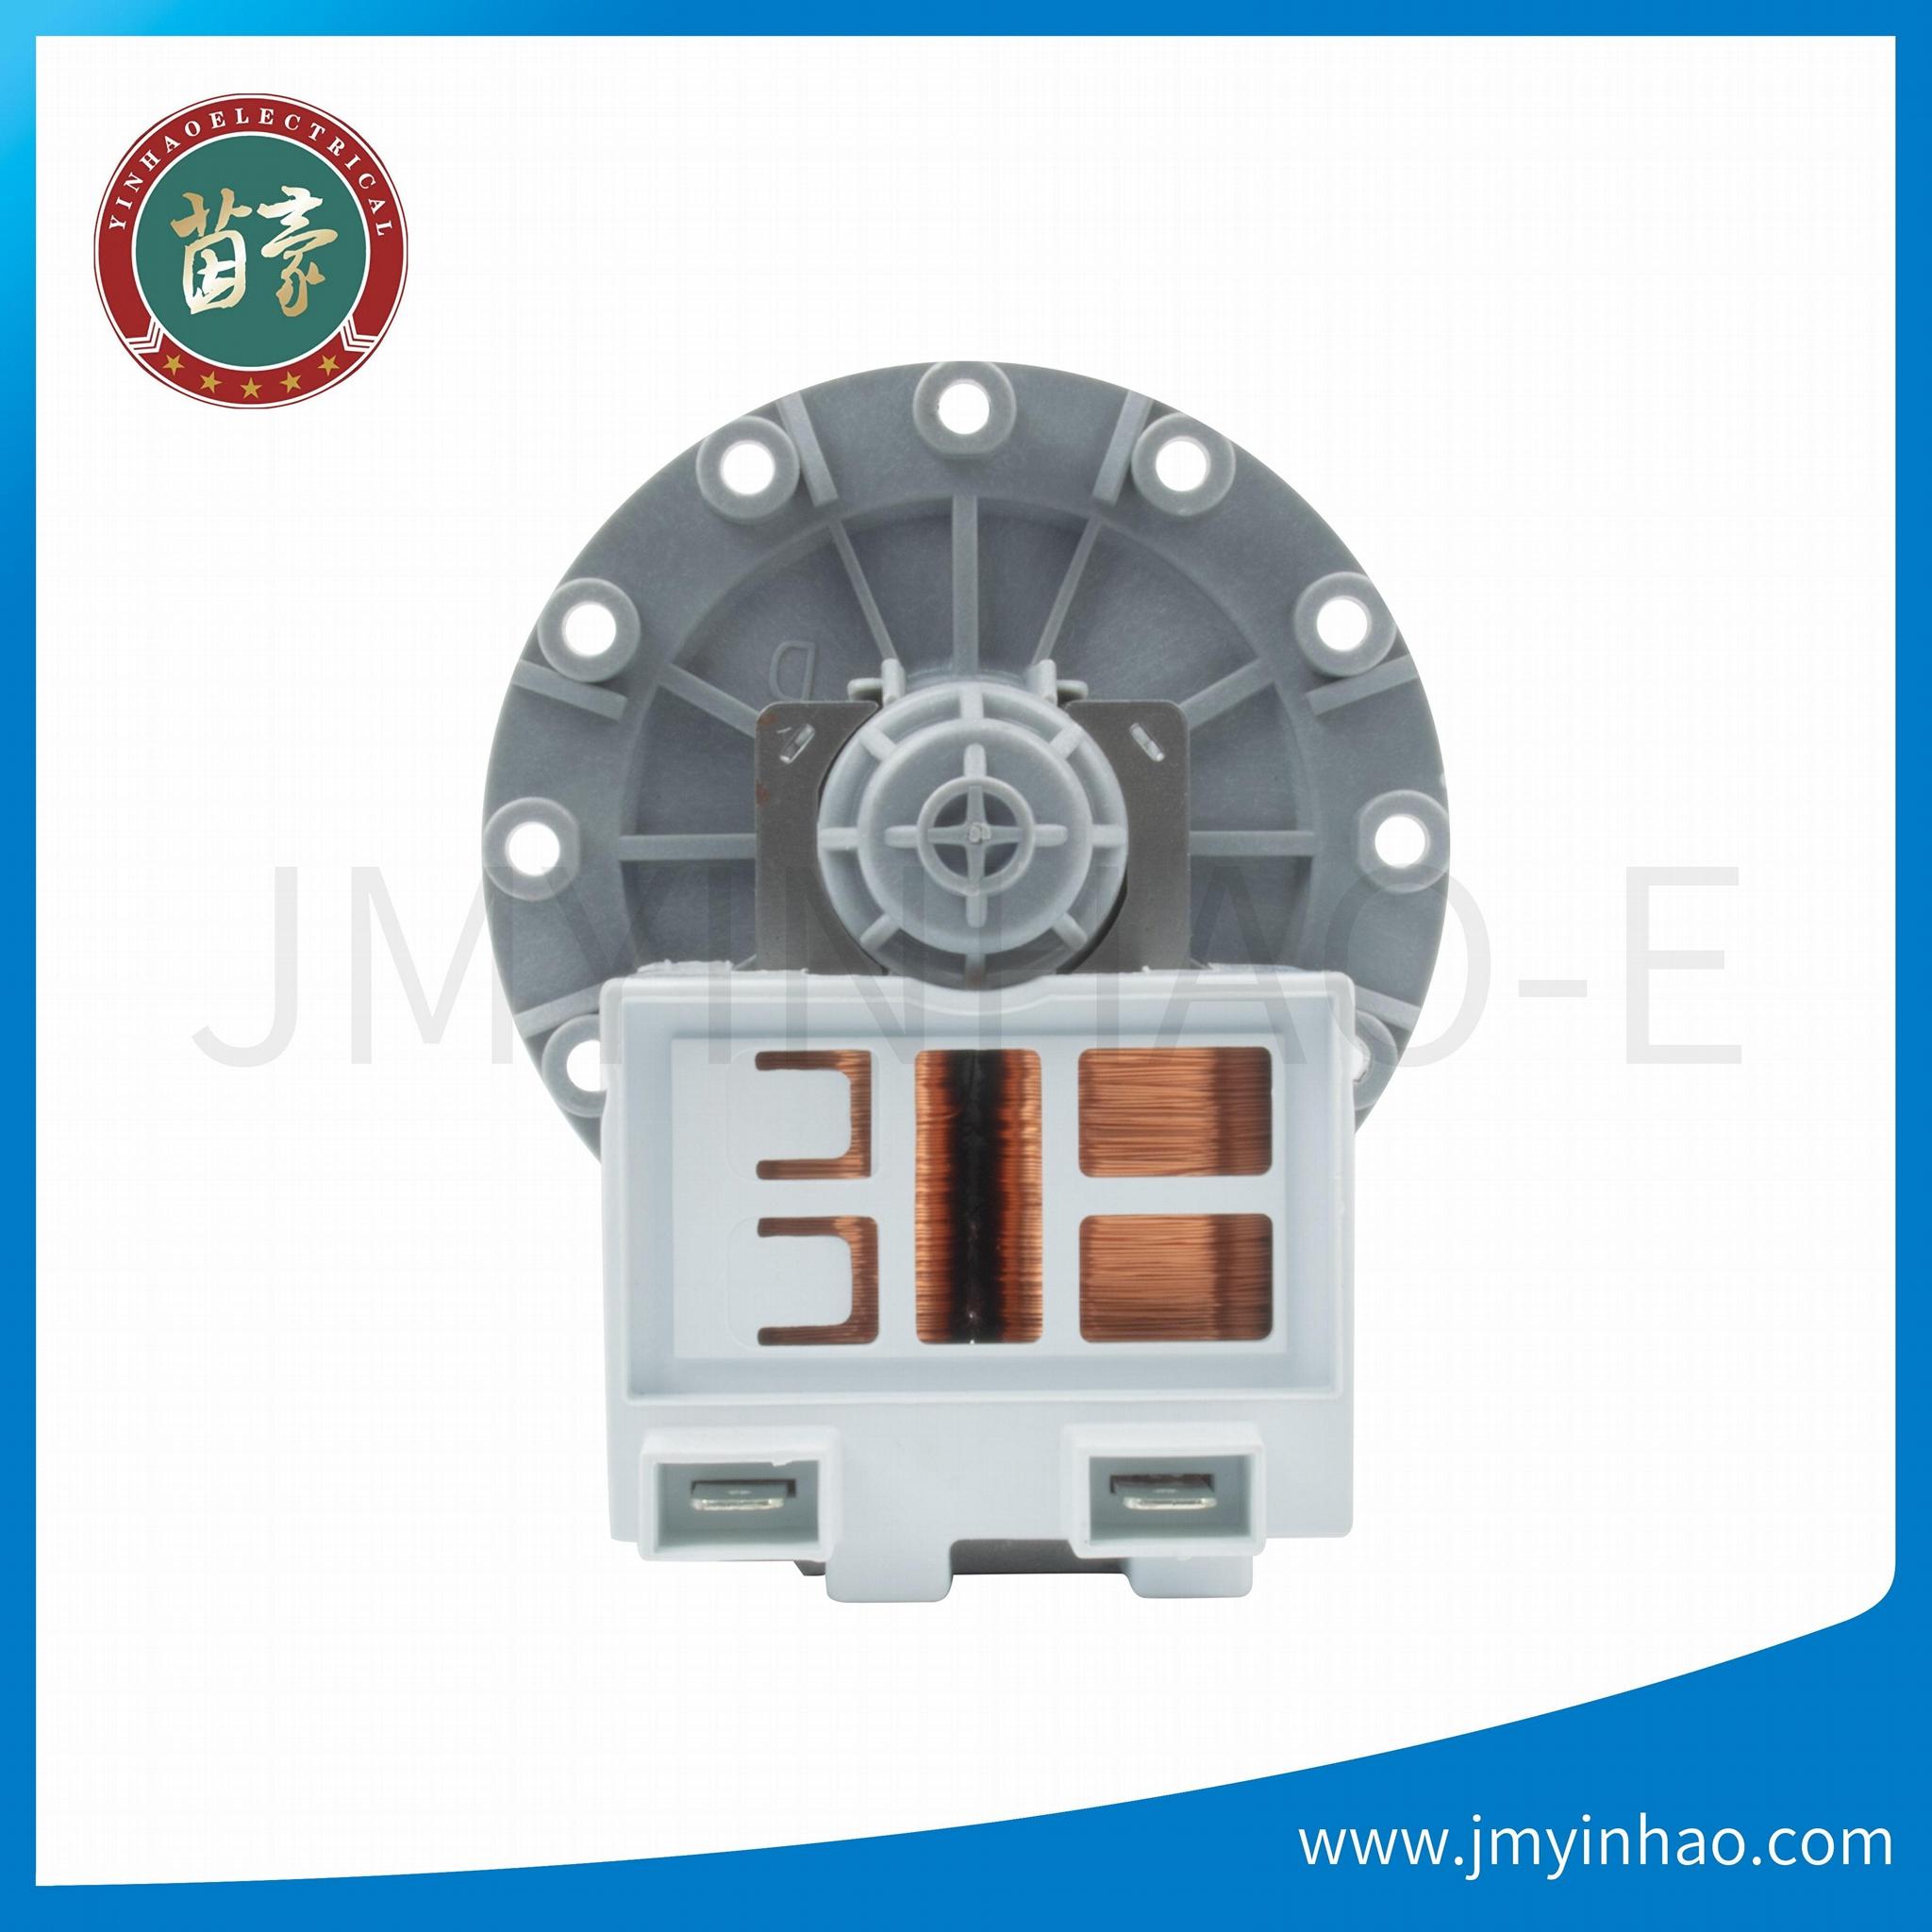 220V 60Hz Brazil market drain pump motor for washing machine 3